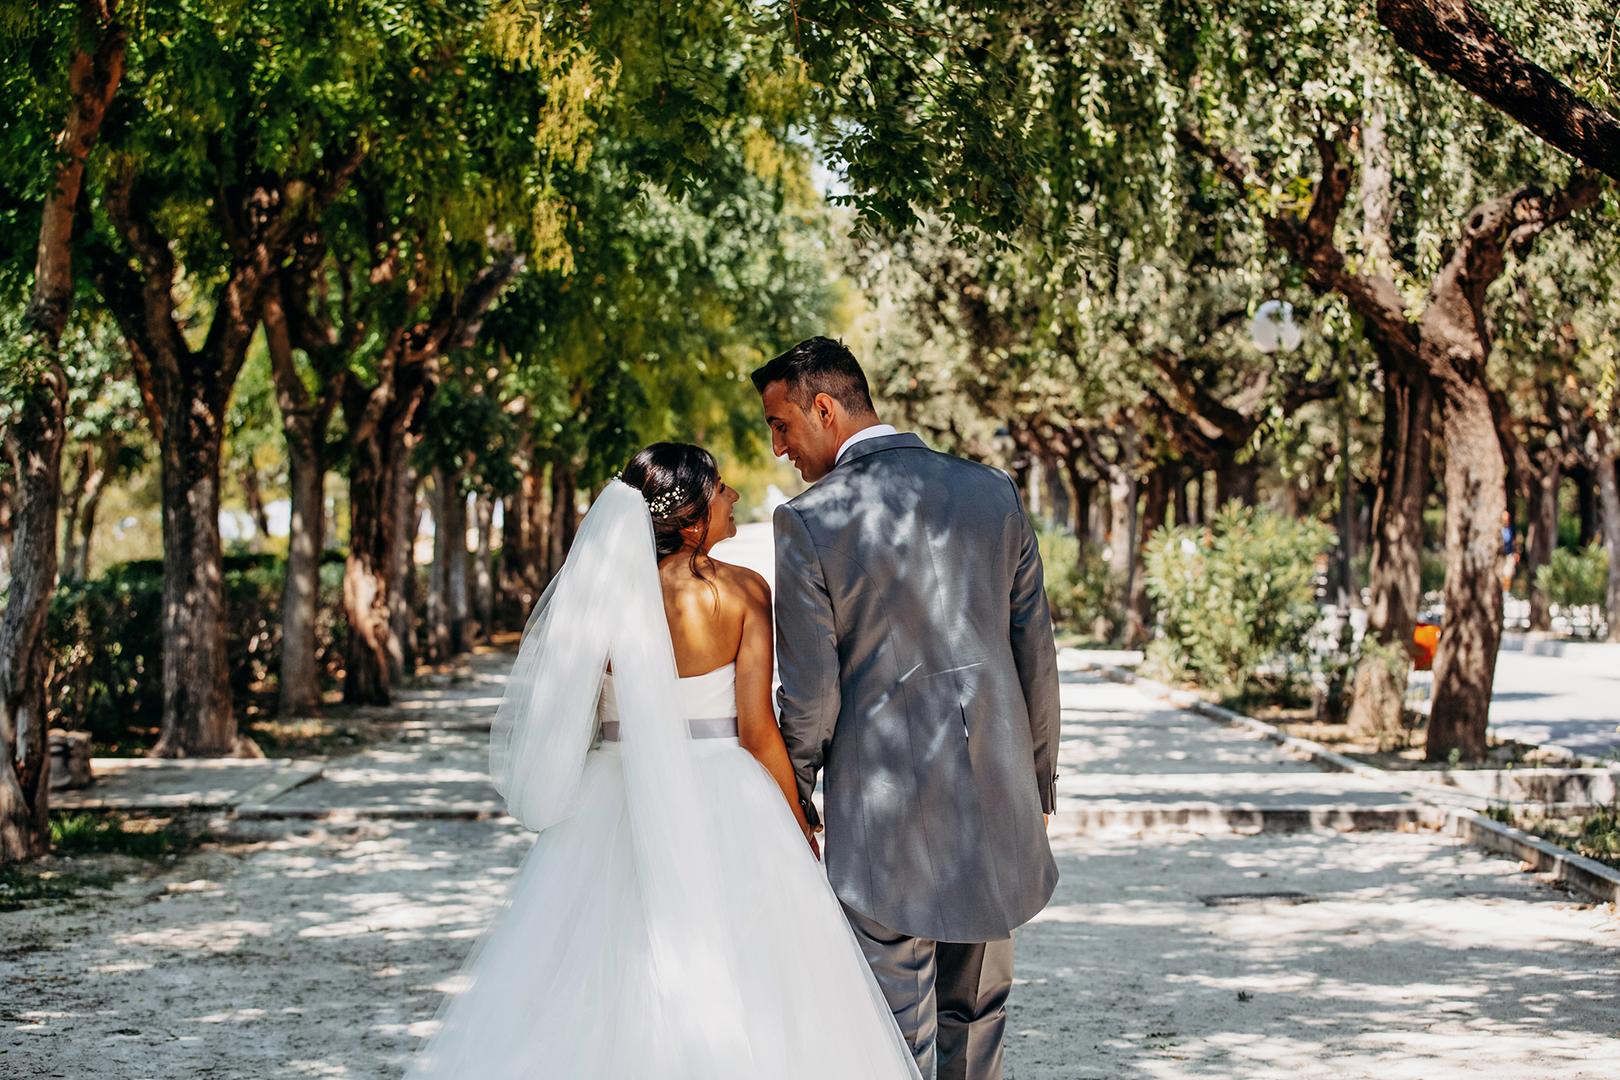 34 gianni-lepore-sposi-briede-groom-villa-comunale-lucera-wedding-italia